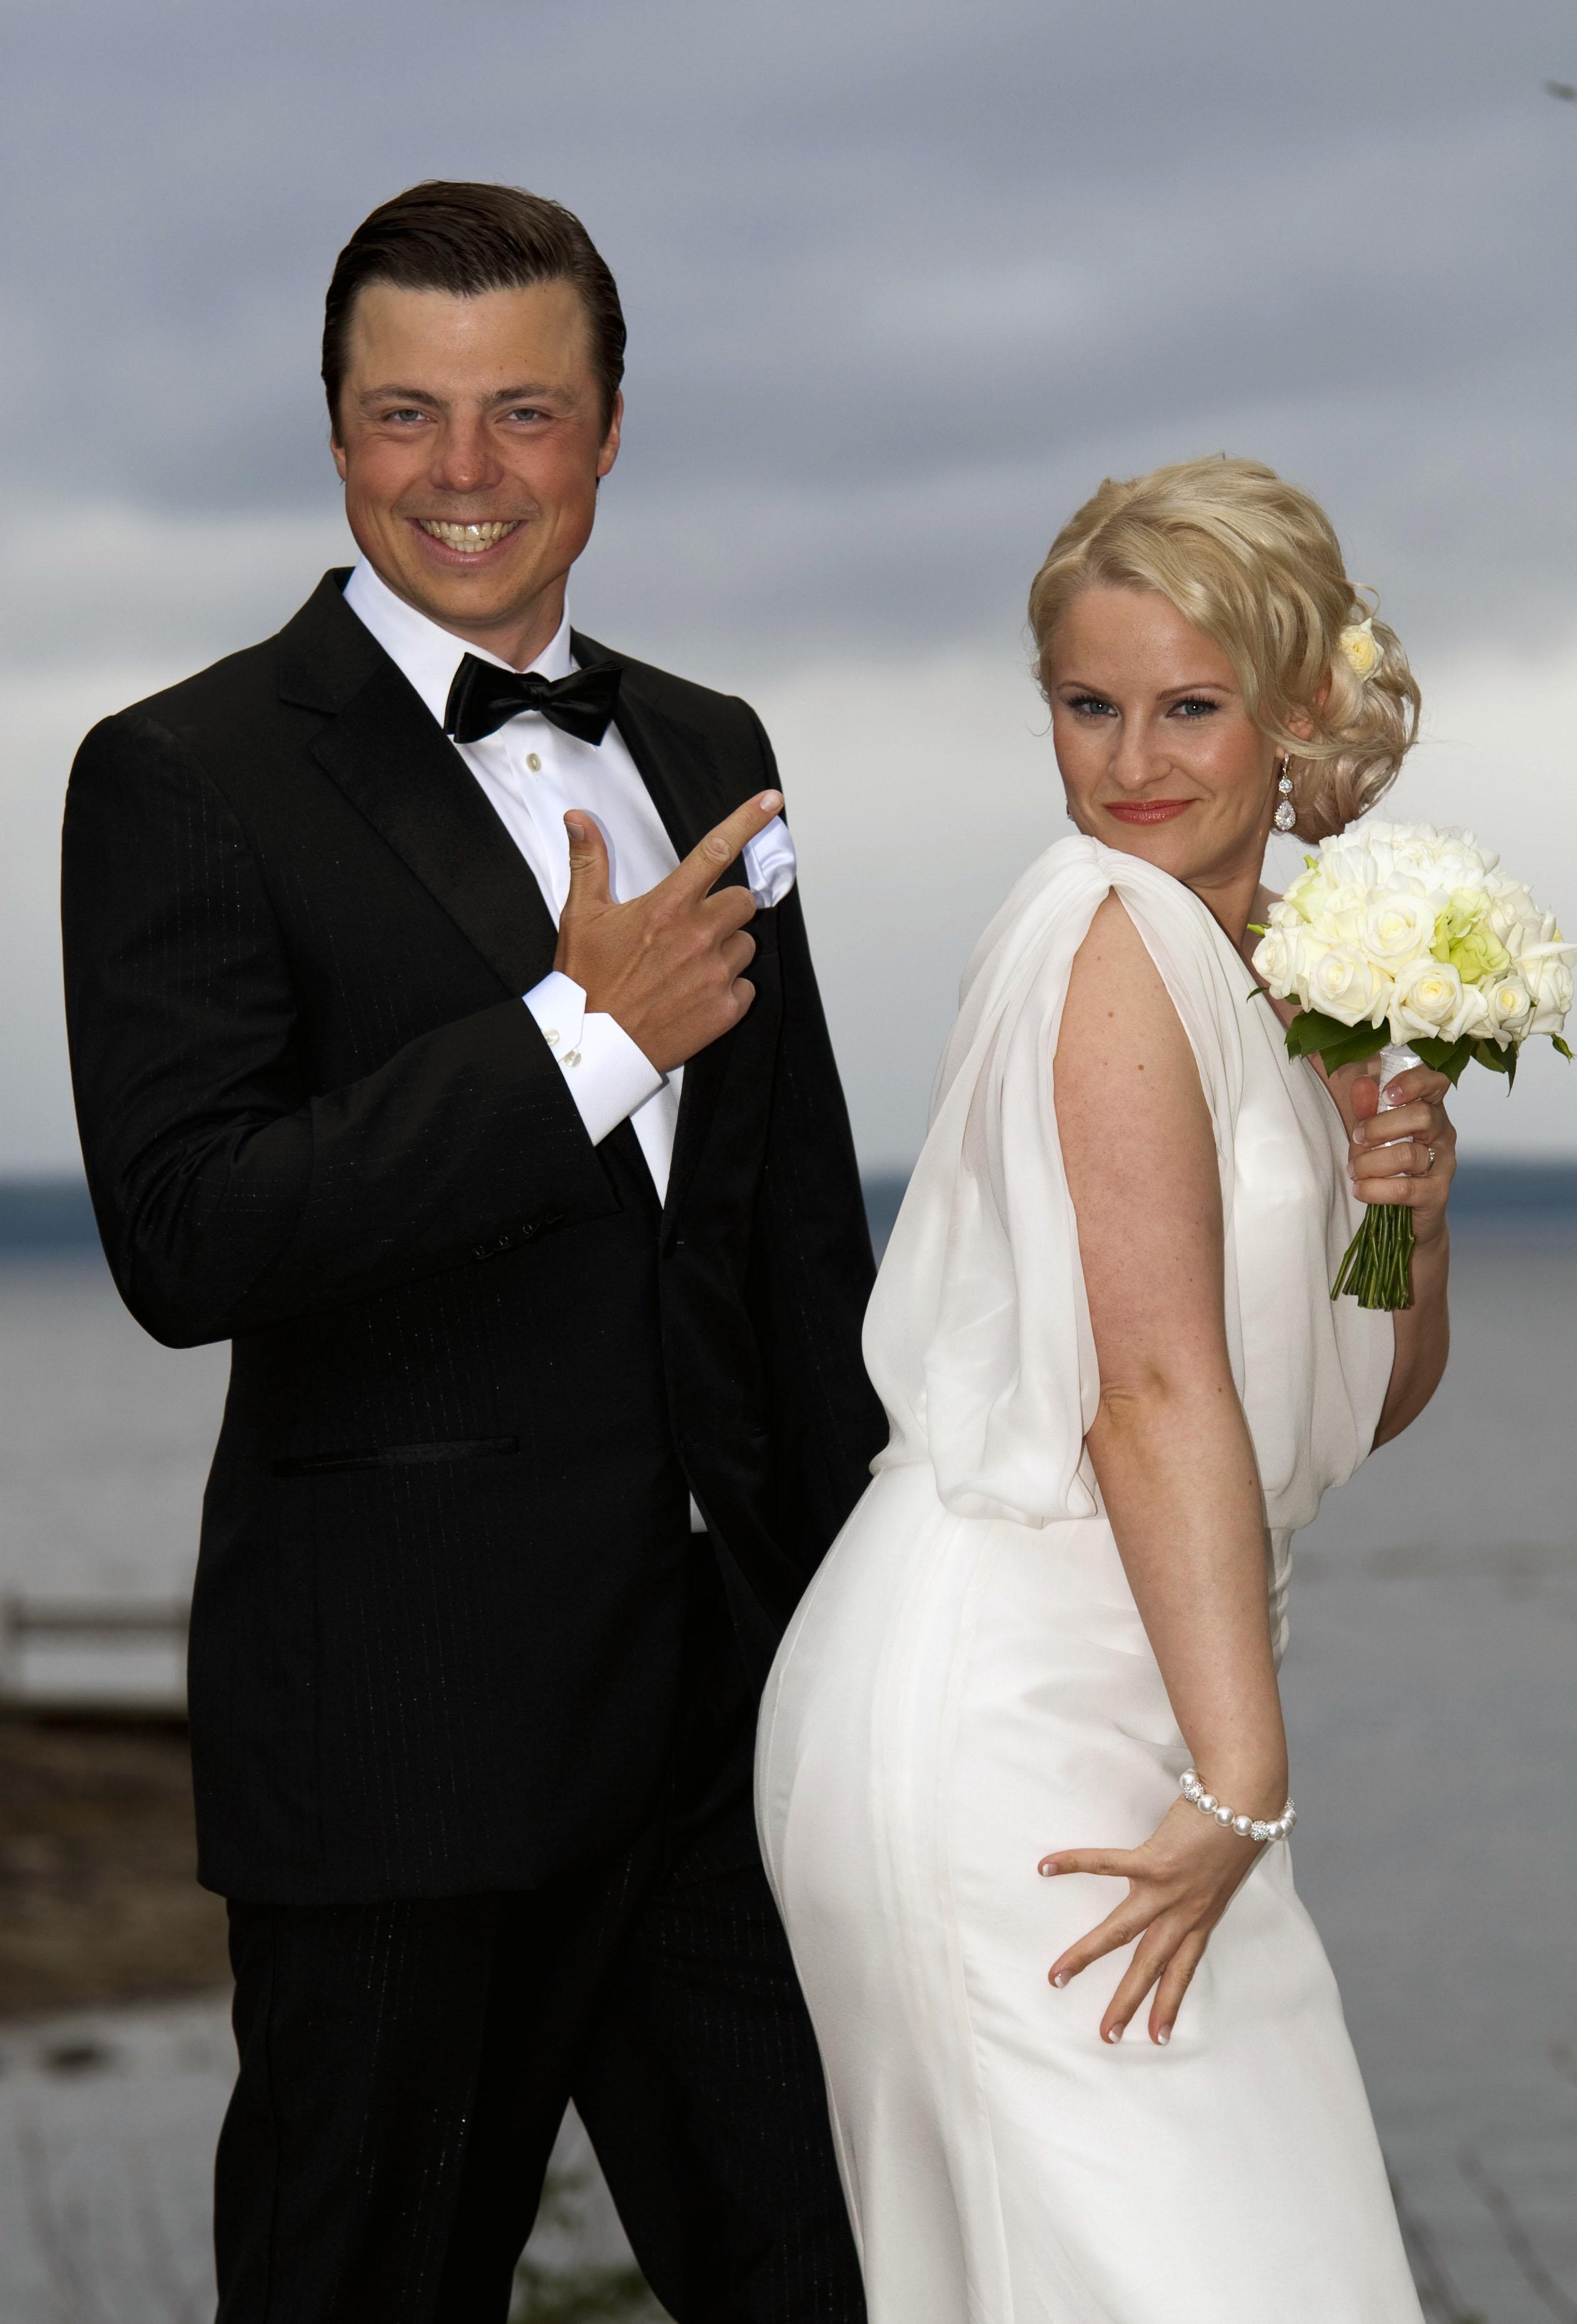 mr and mrs bond